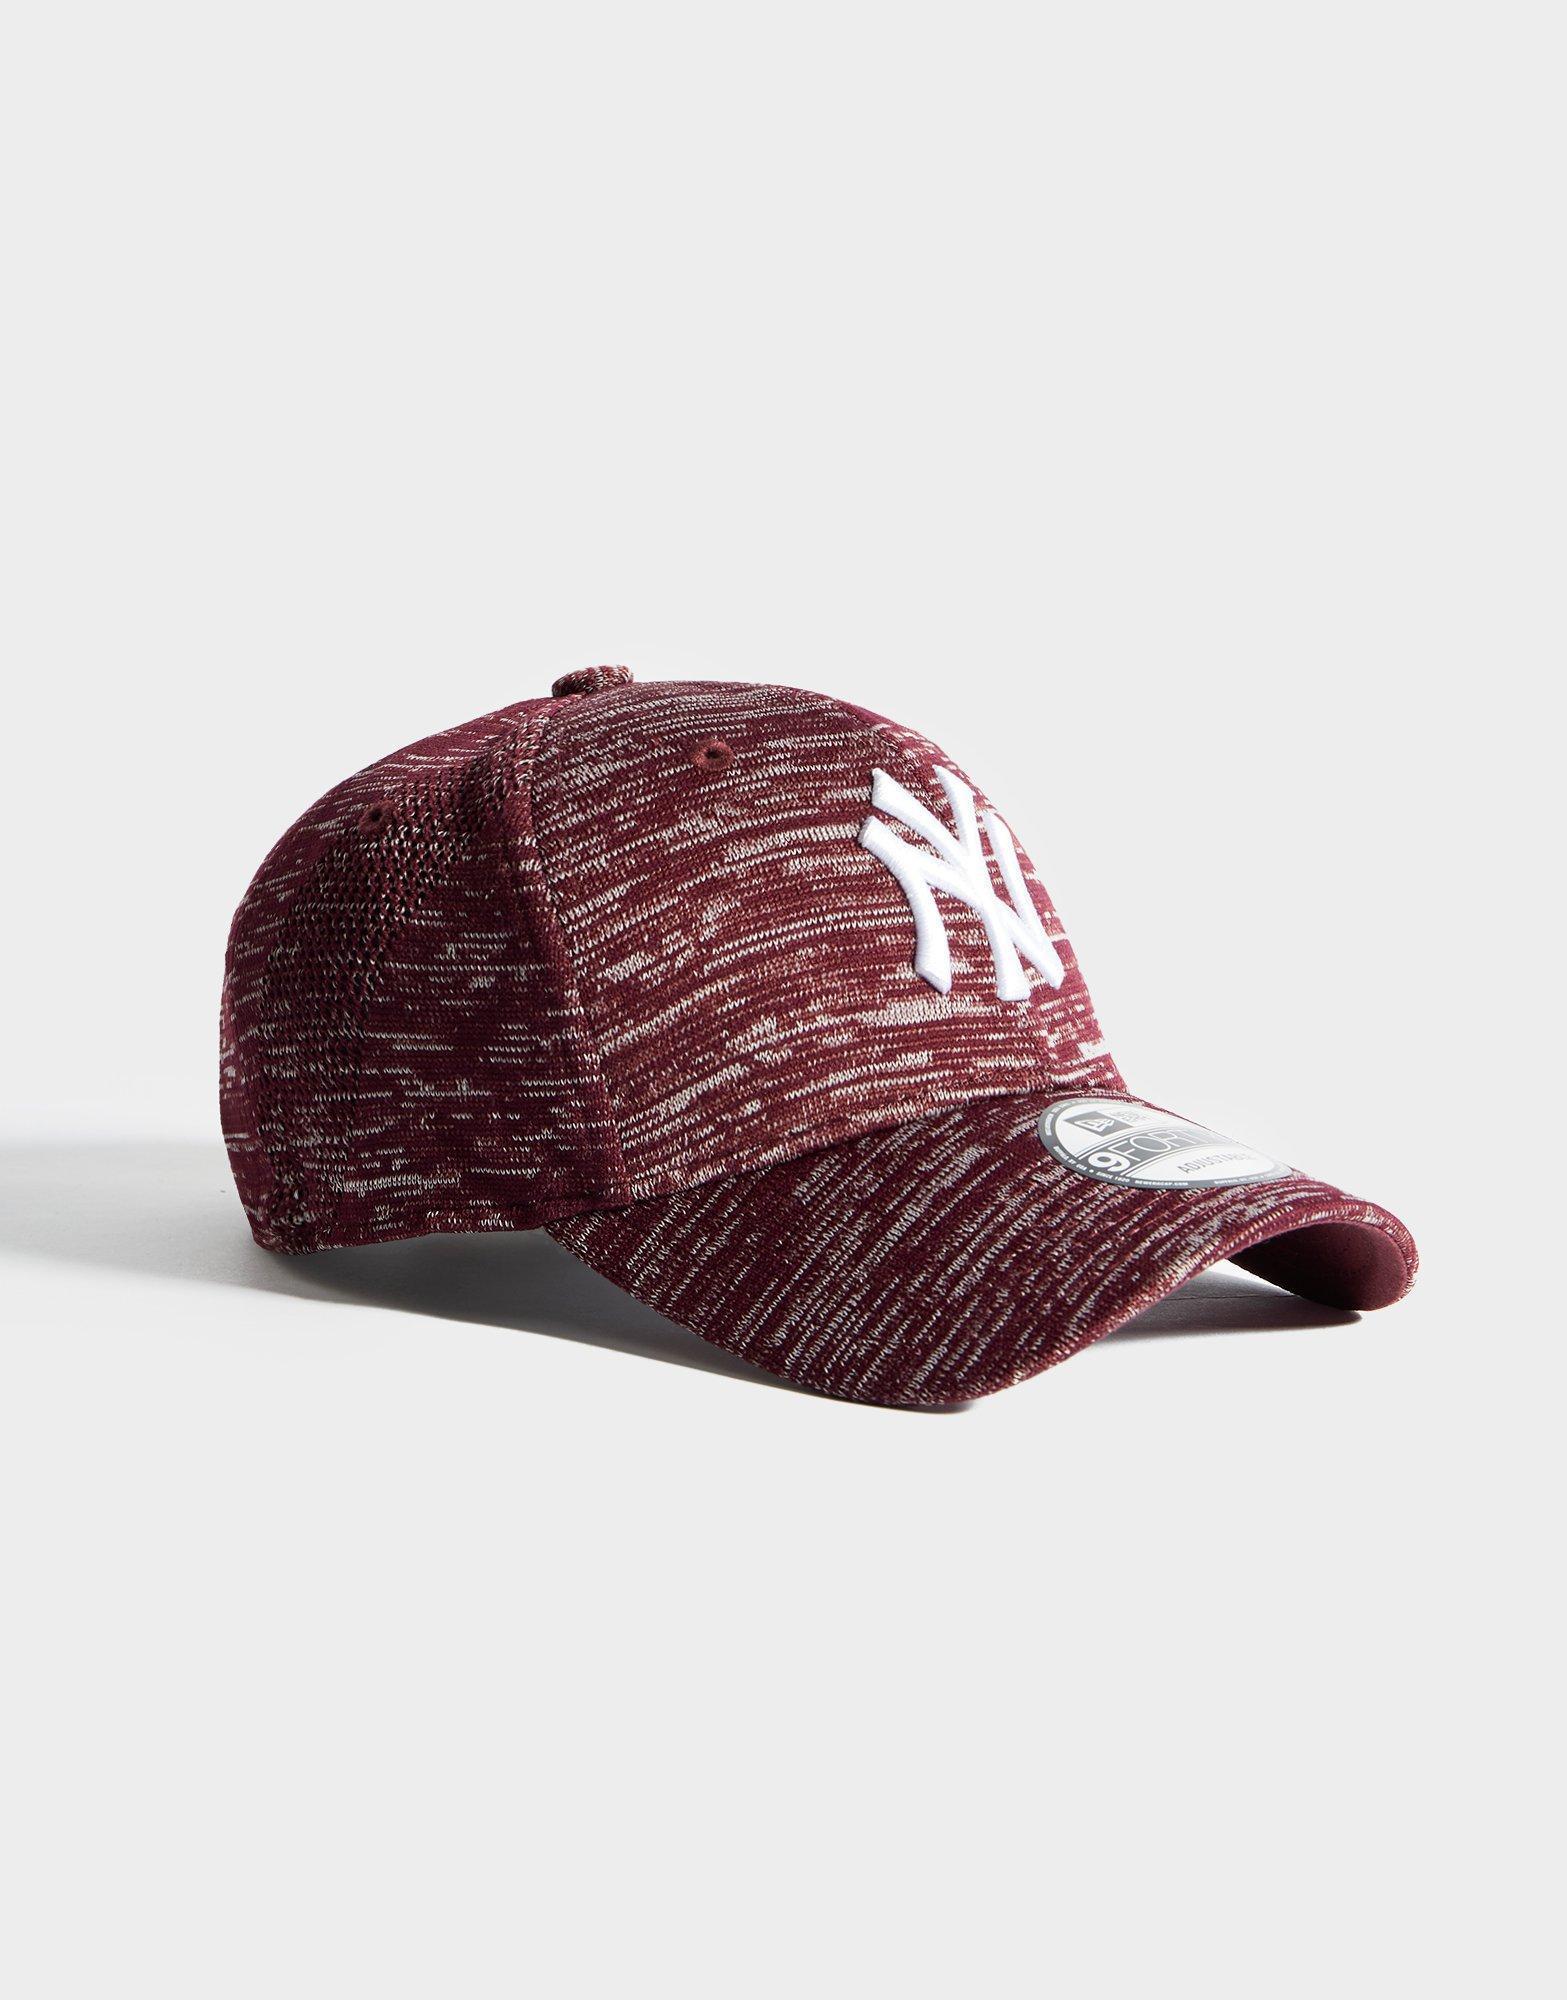 ec15260f907 ... uk ktz mlb new york yankees 9forty cap in red lyst 0618f 96e6f